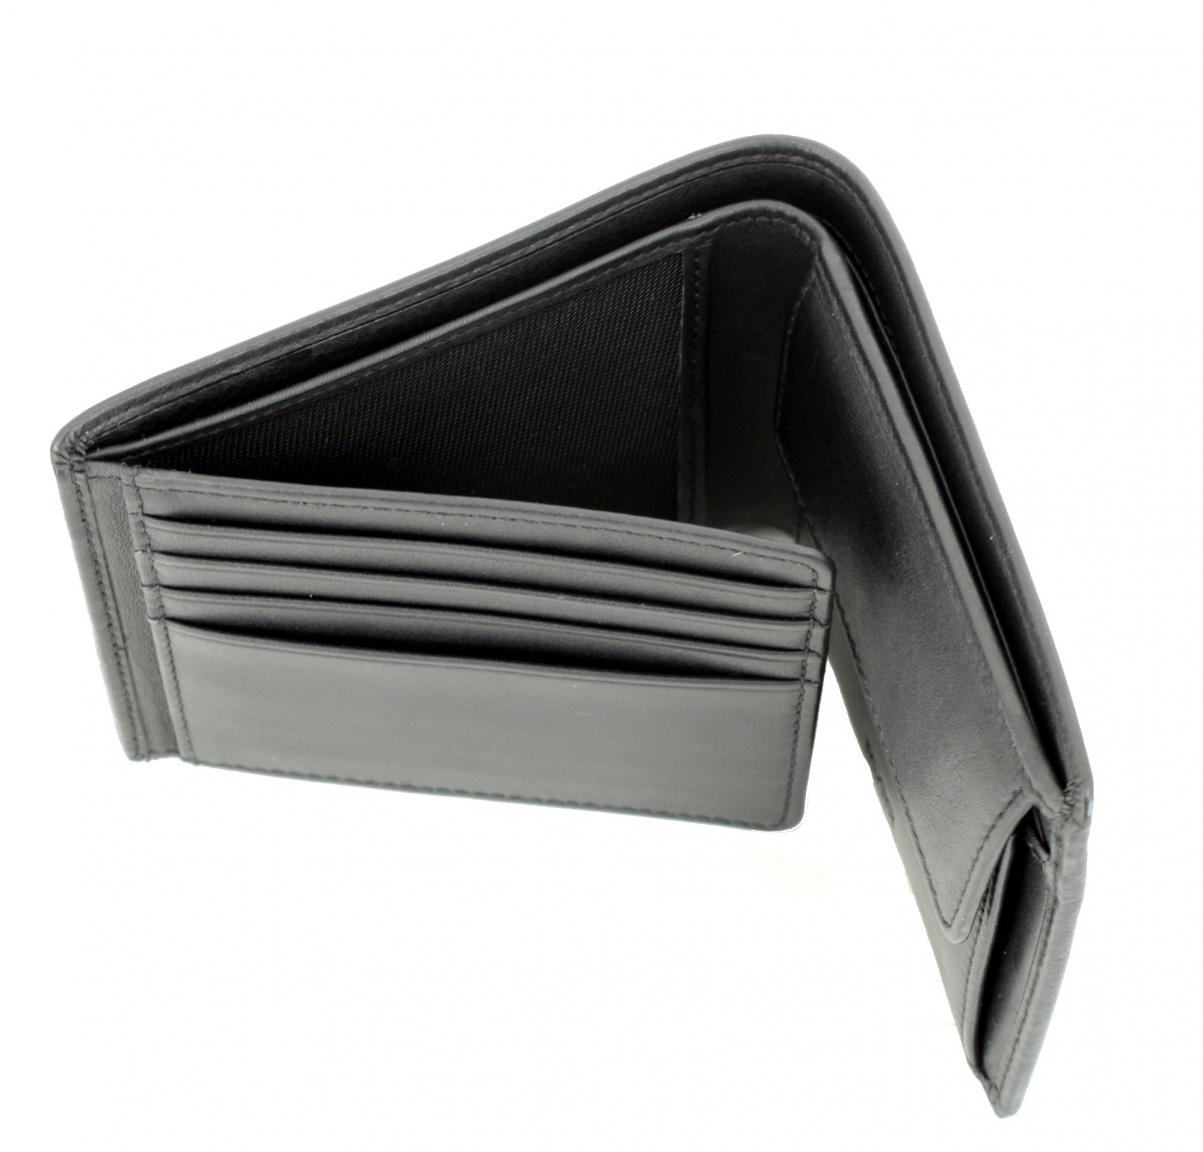 hugo boss portemonnaie majestic s trifold schwarz bags. Black Bedroom Furniture Sets. Home Design Ideas